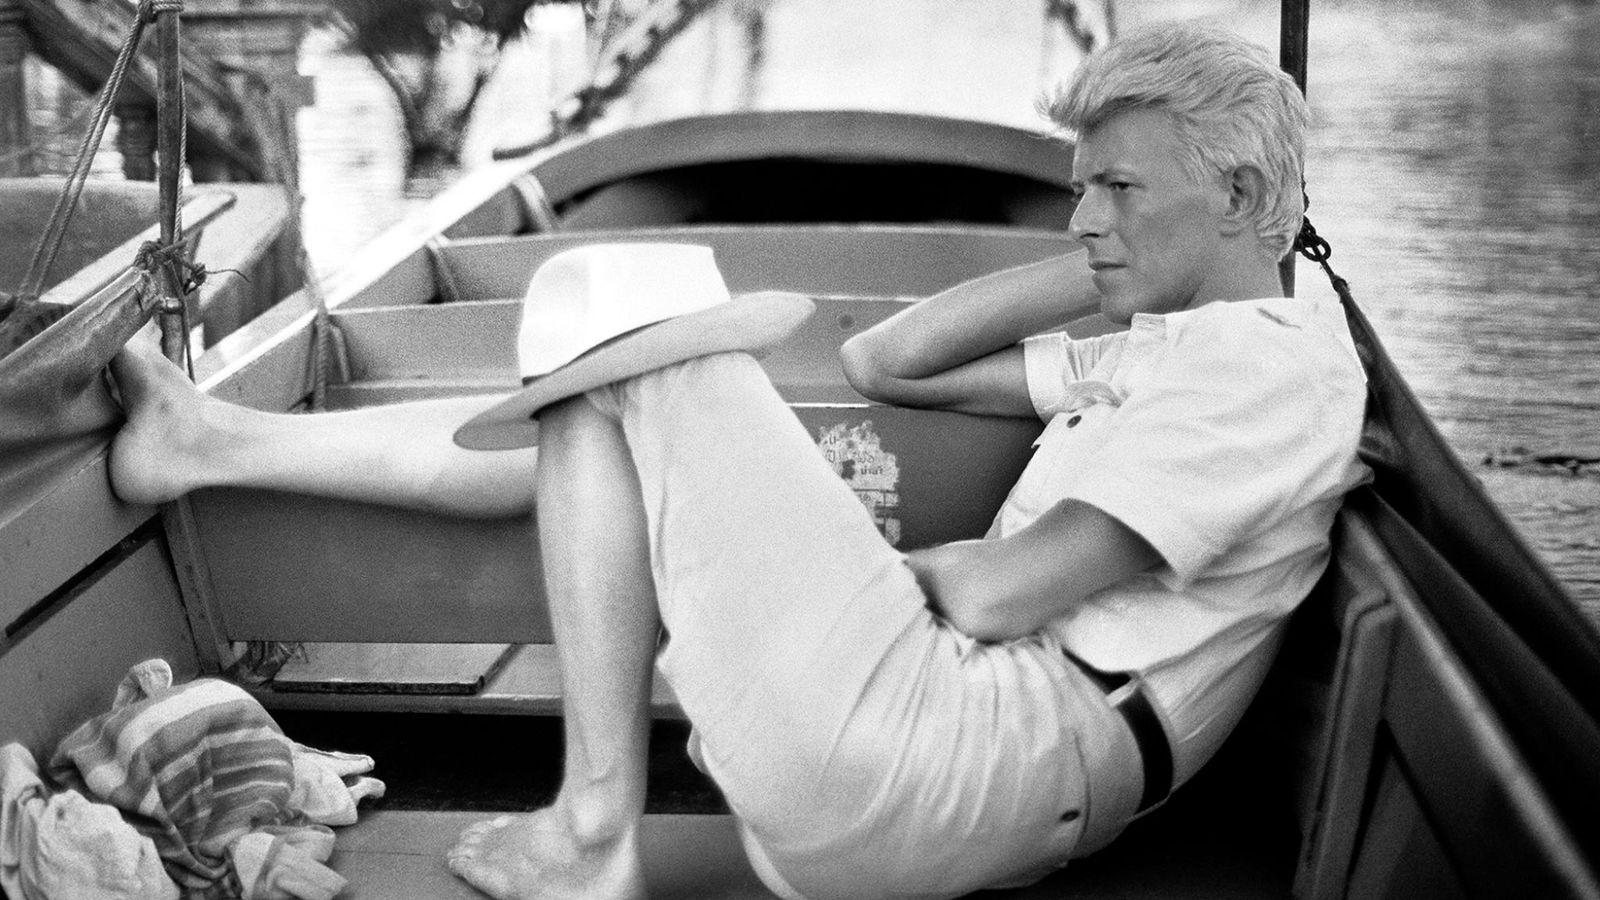 David Bowie, pictured in Bangkok, Thailand, 1983 by Denis O'Regan.jpg